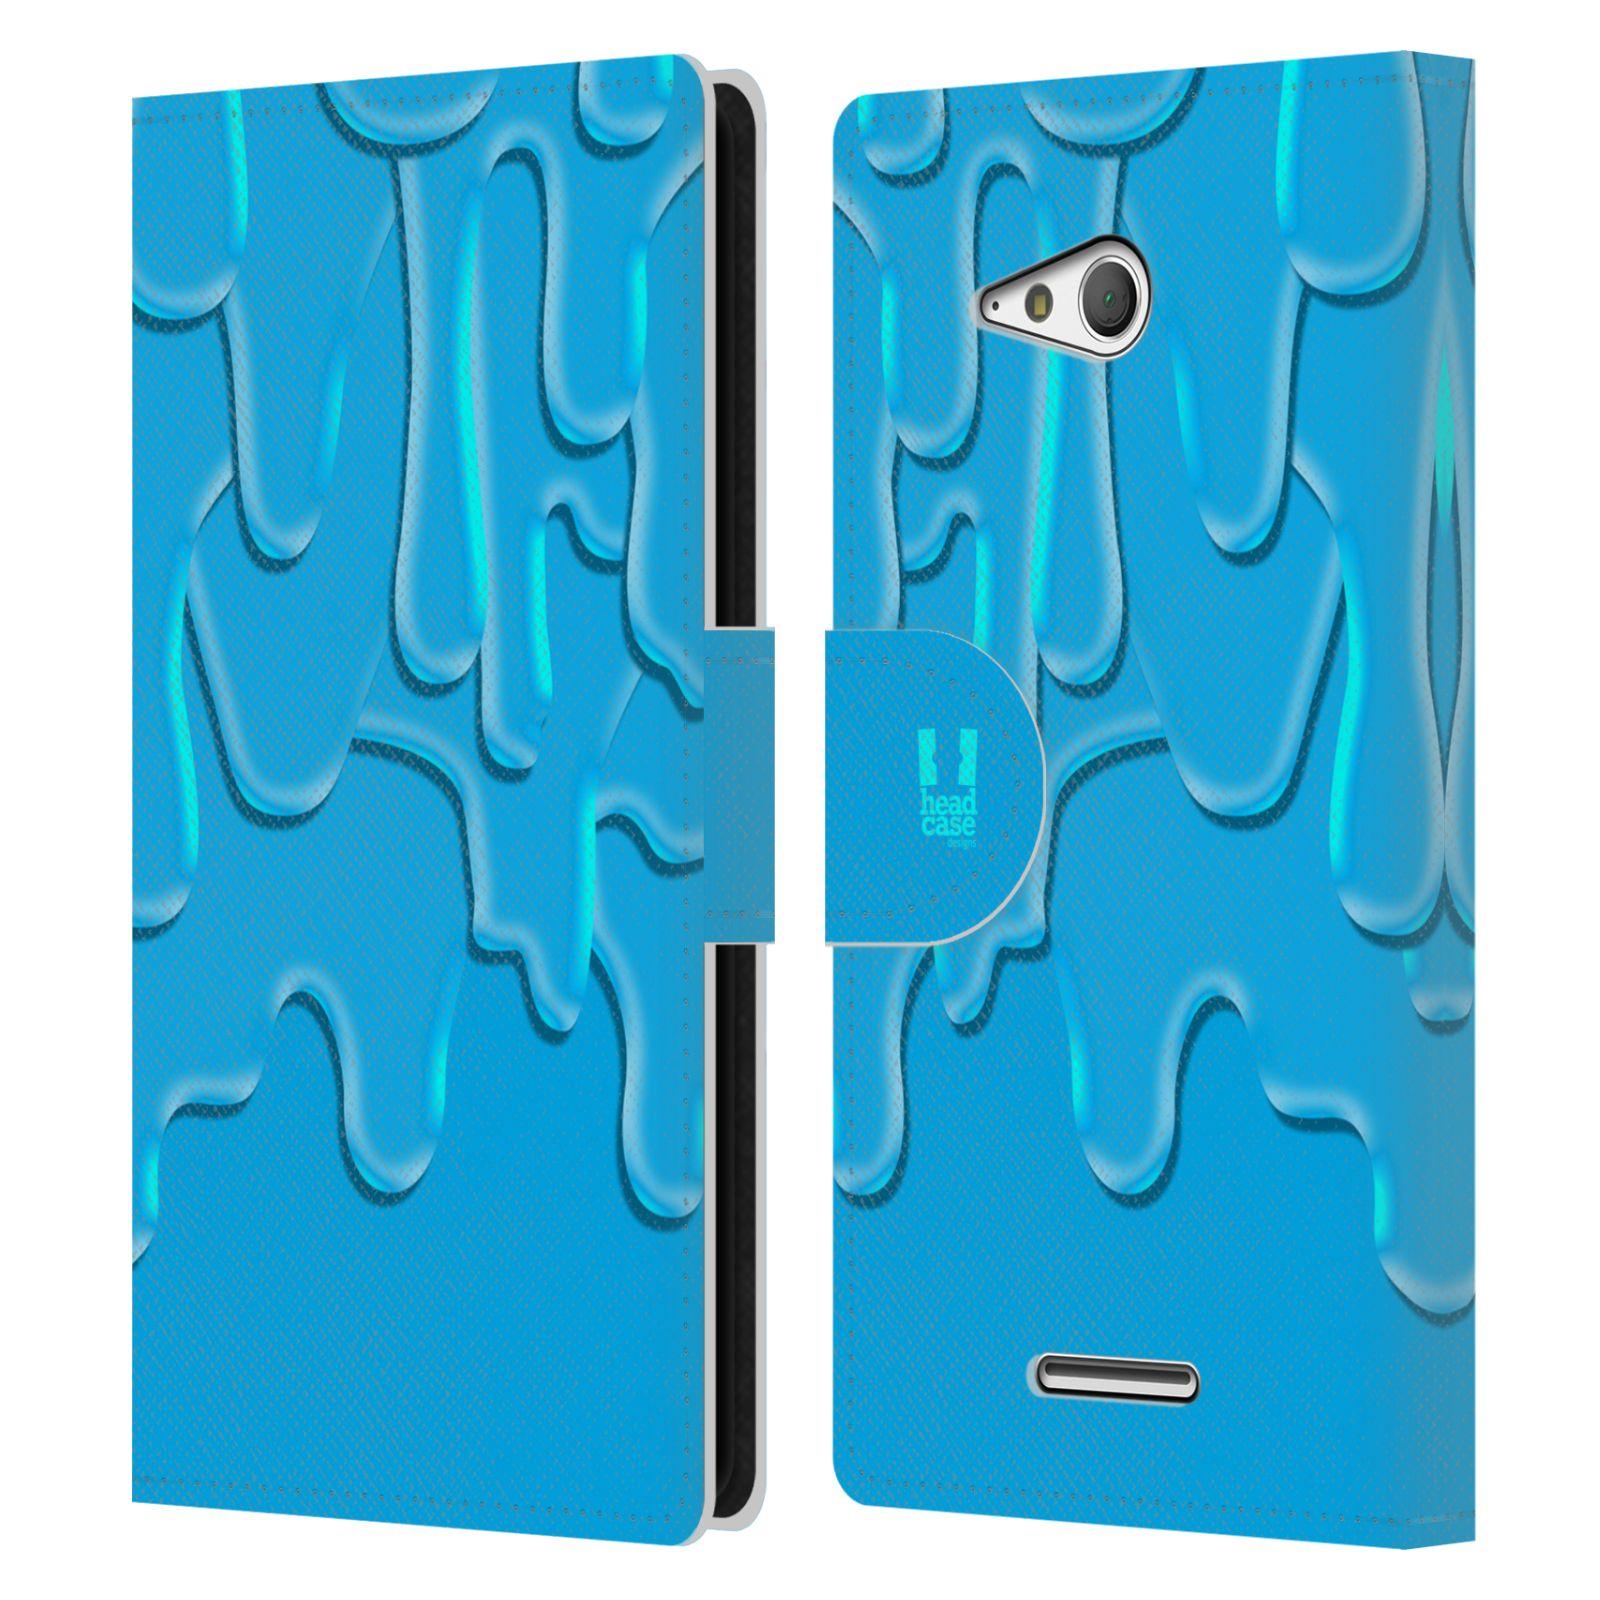 HEAD CASE Flipové pouzdro pro mobil SONY XPERIA E4g ZÁPLAVA BARVA tyrkysová modrá